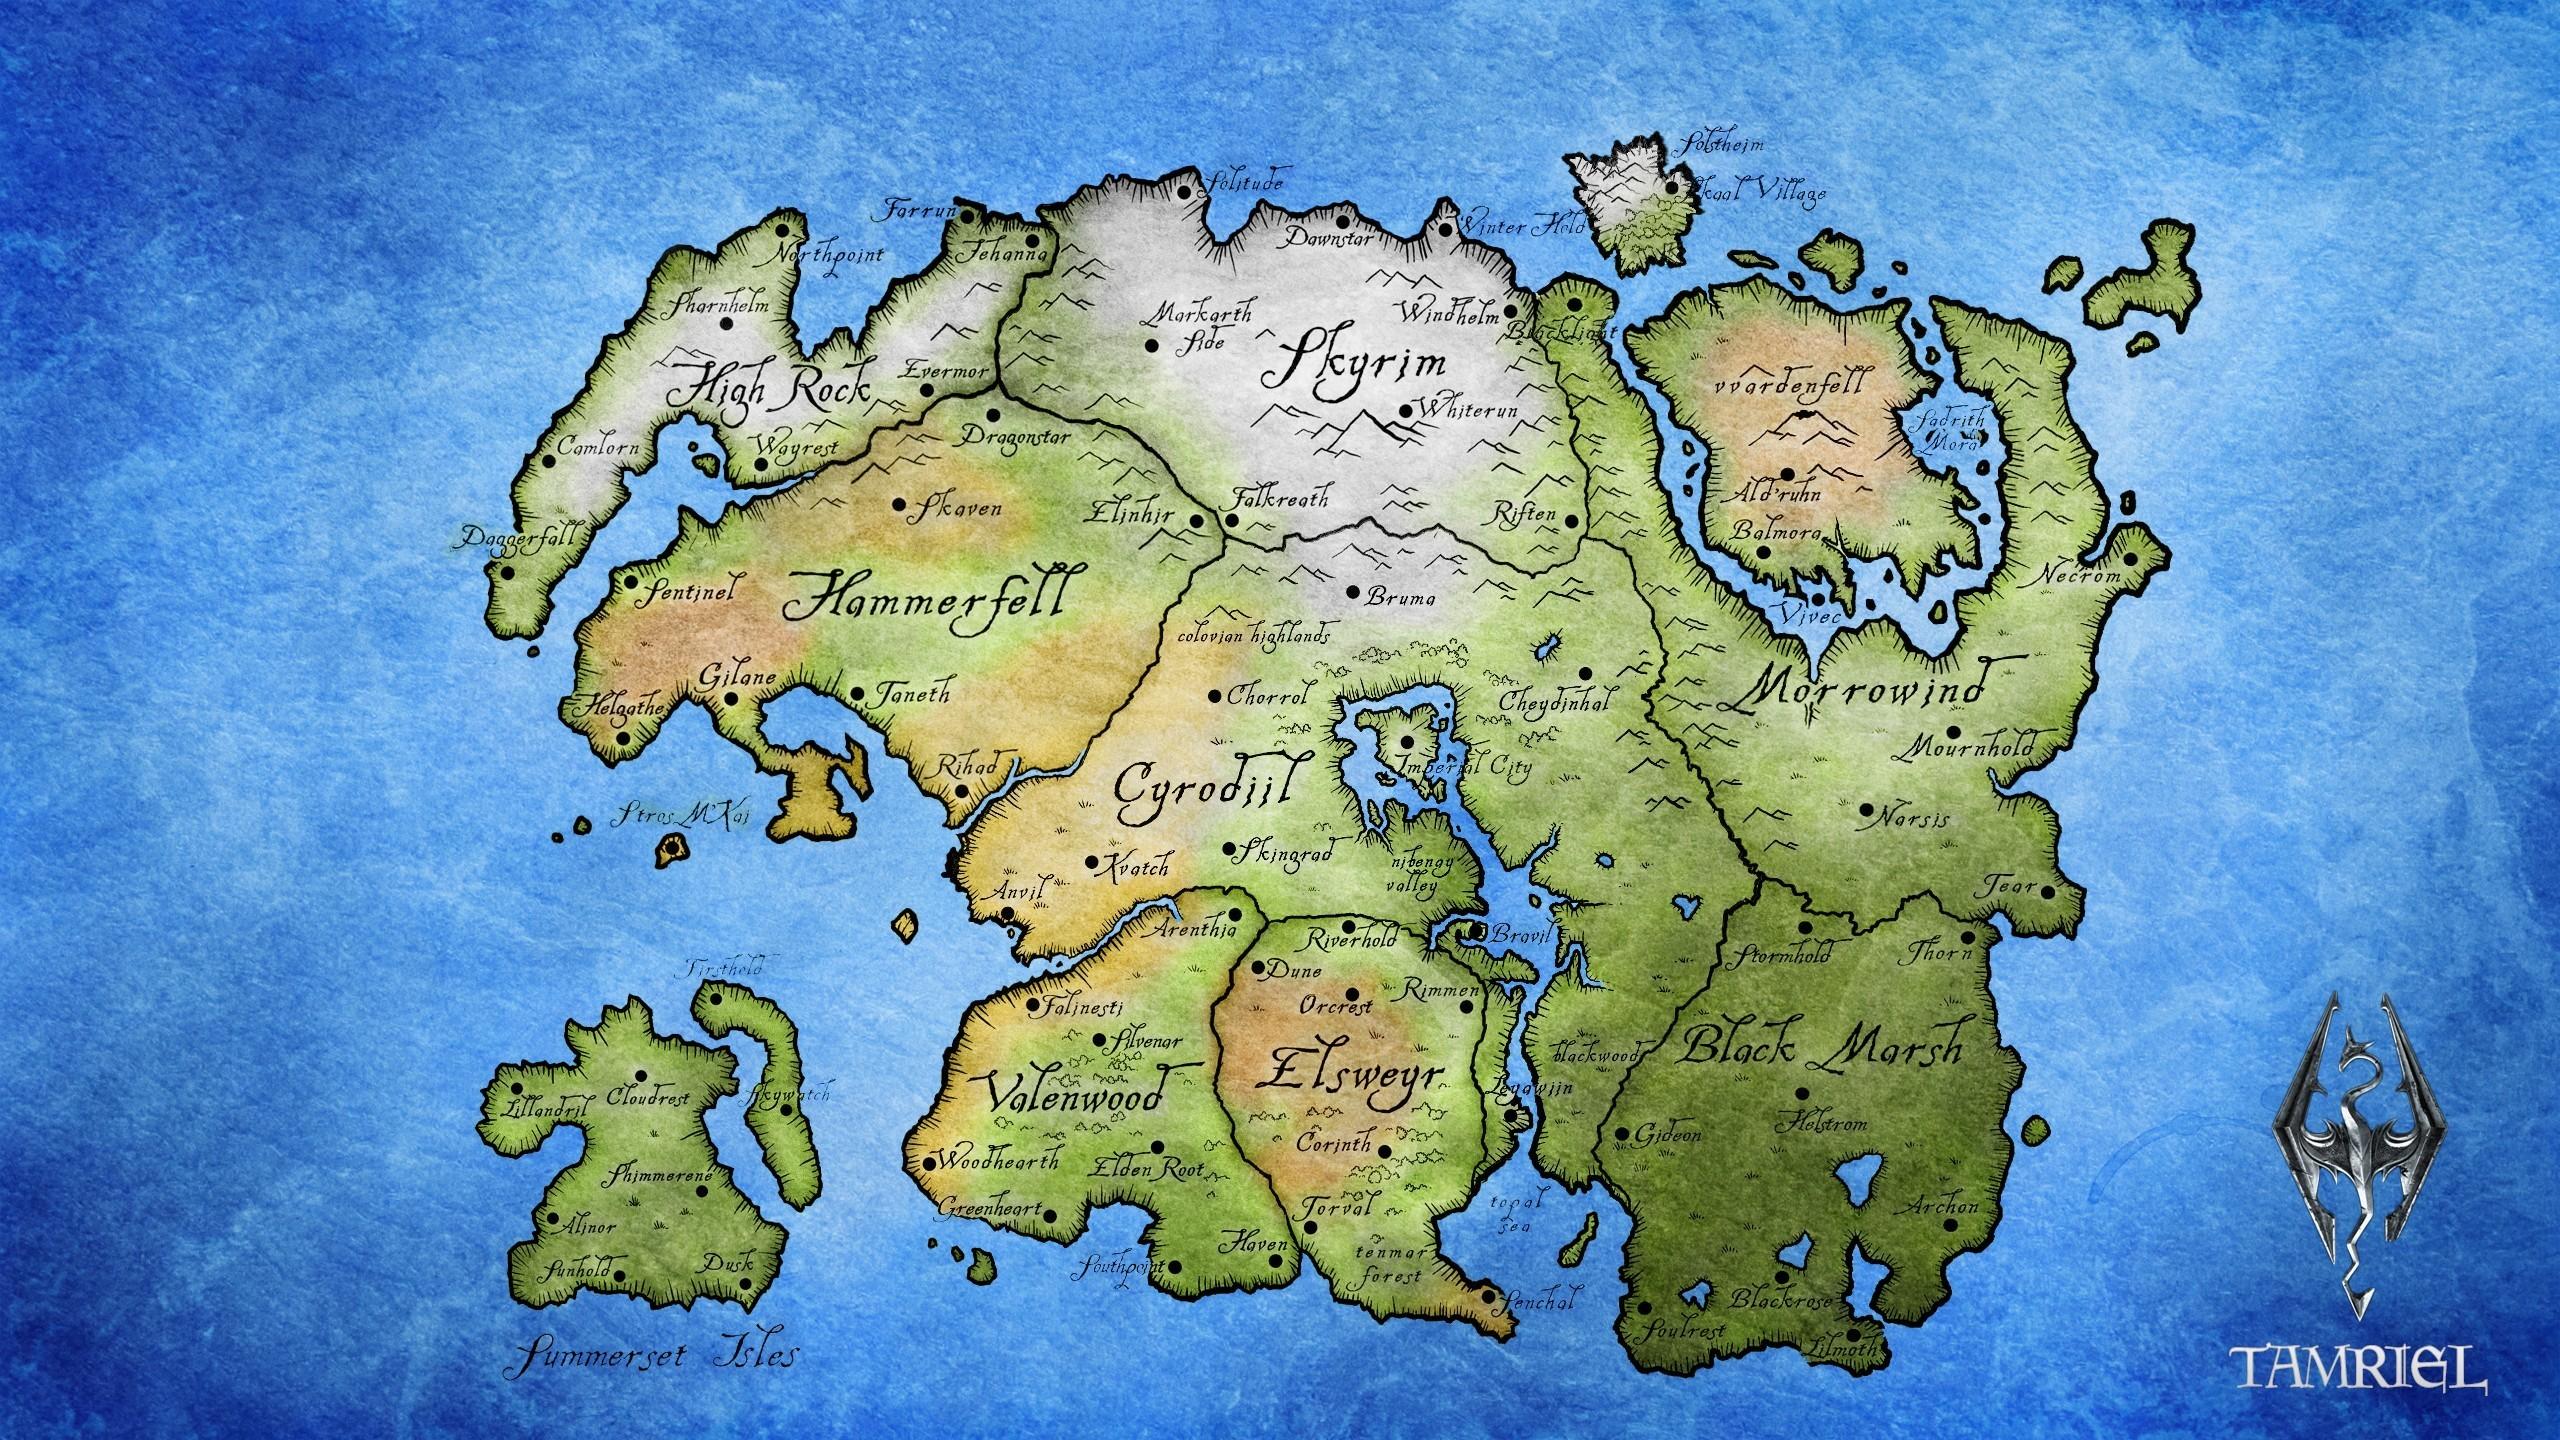 2560x1440 Px Elder Scrolls Map Tamriel The III Morrowind IV Oblivion